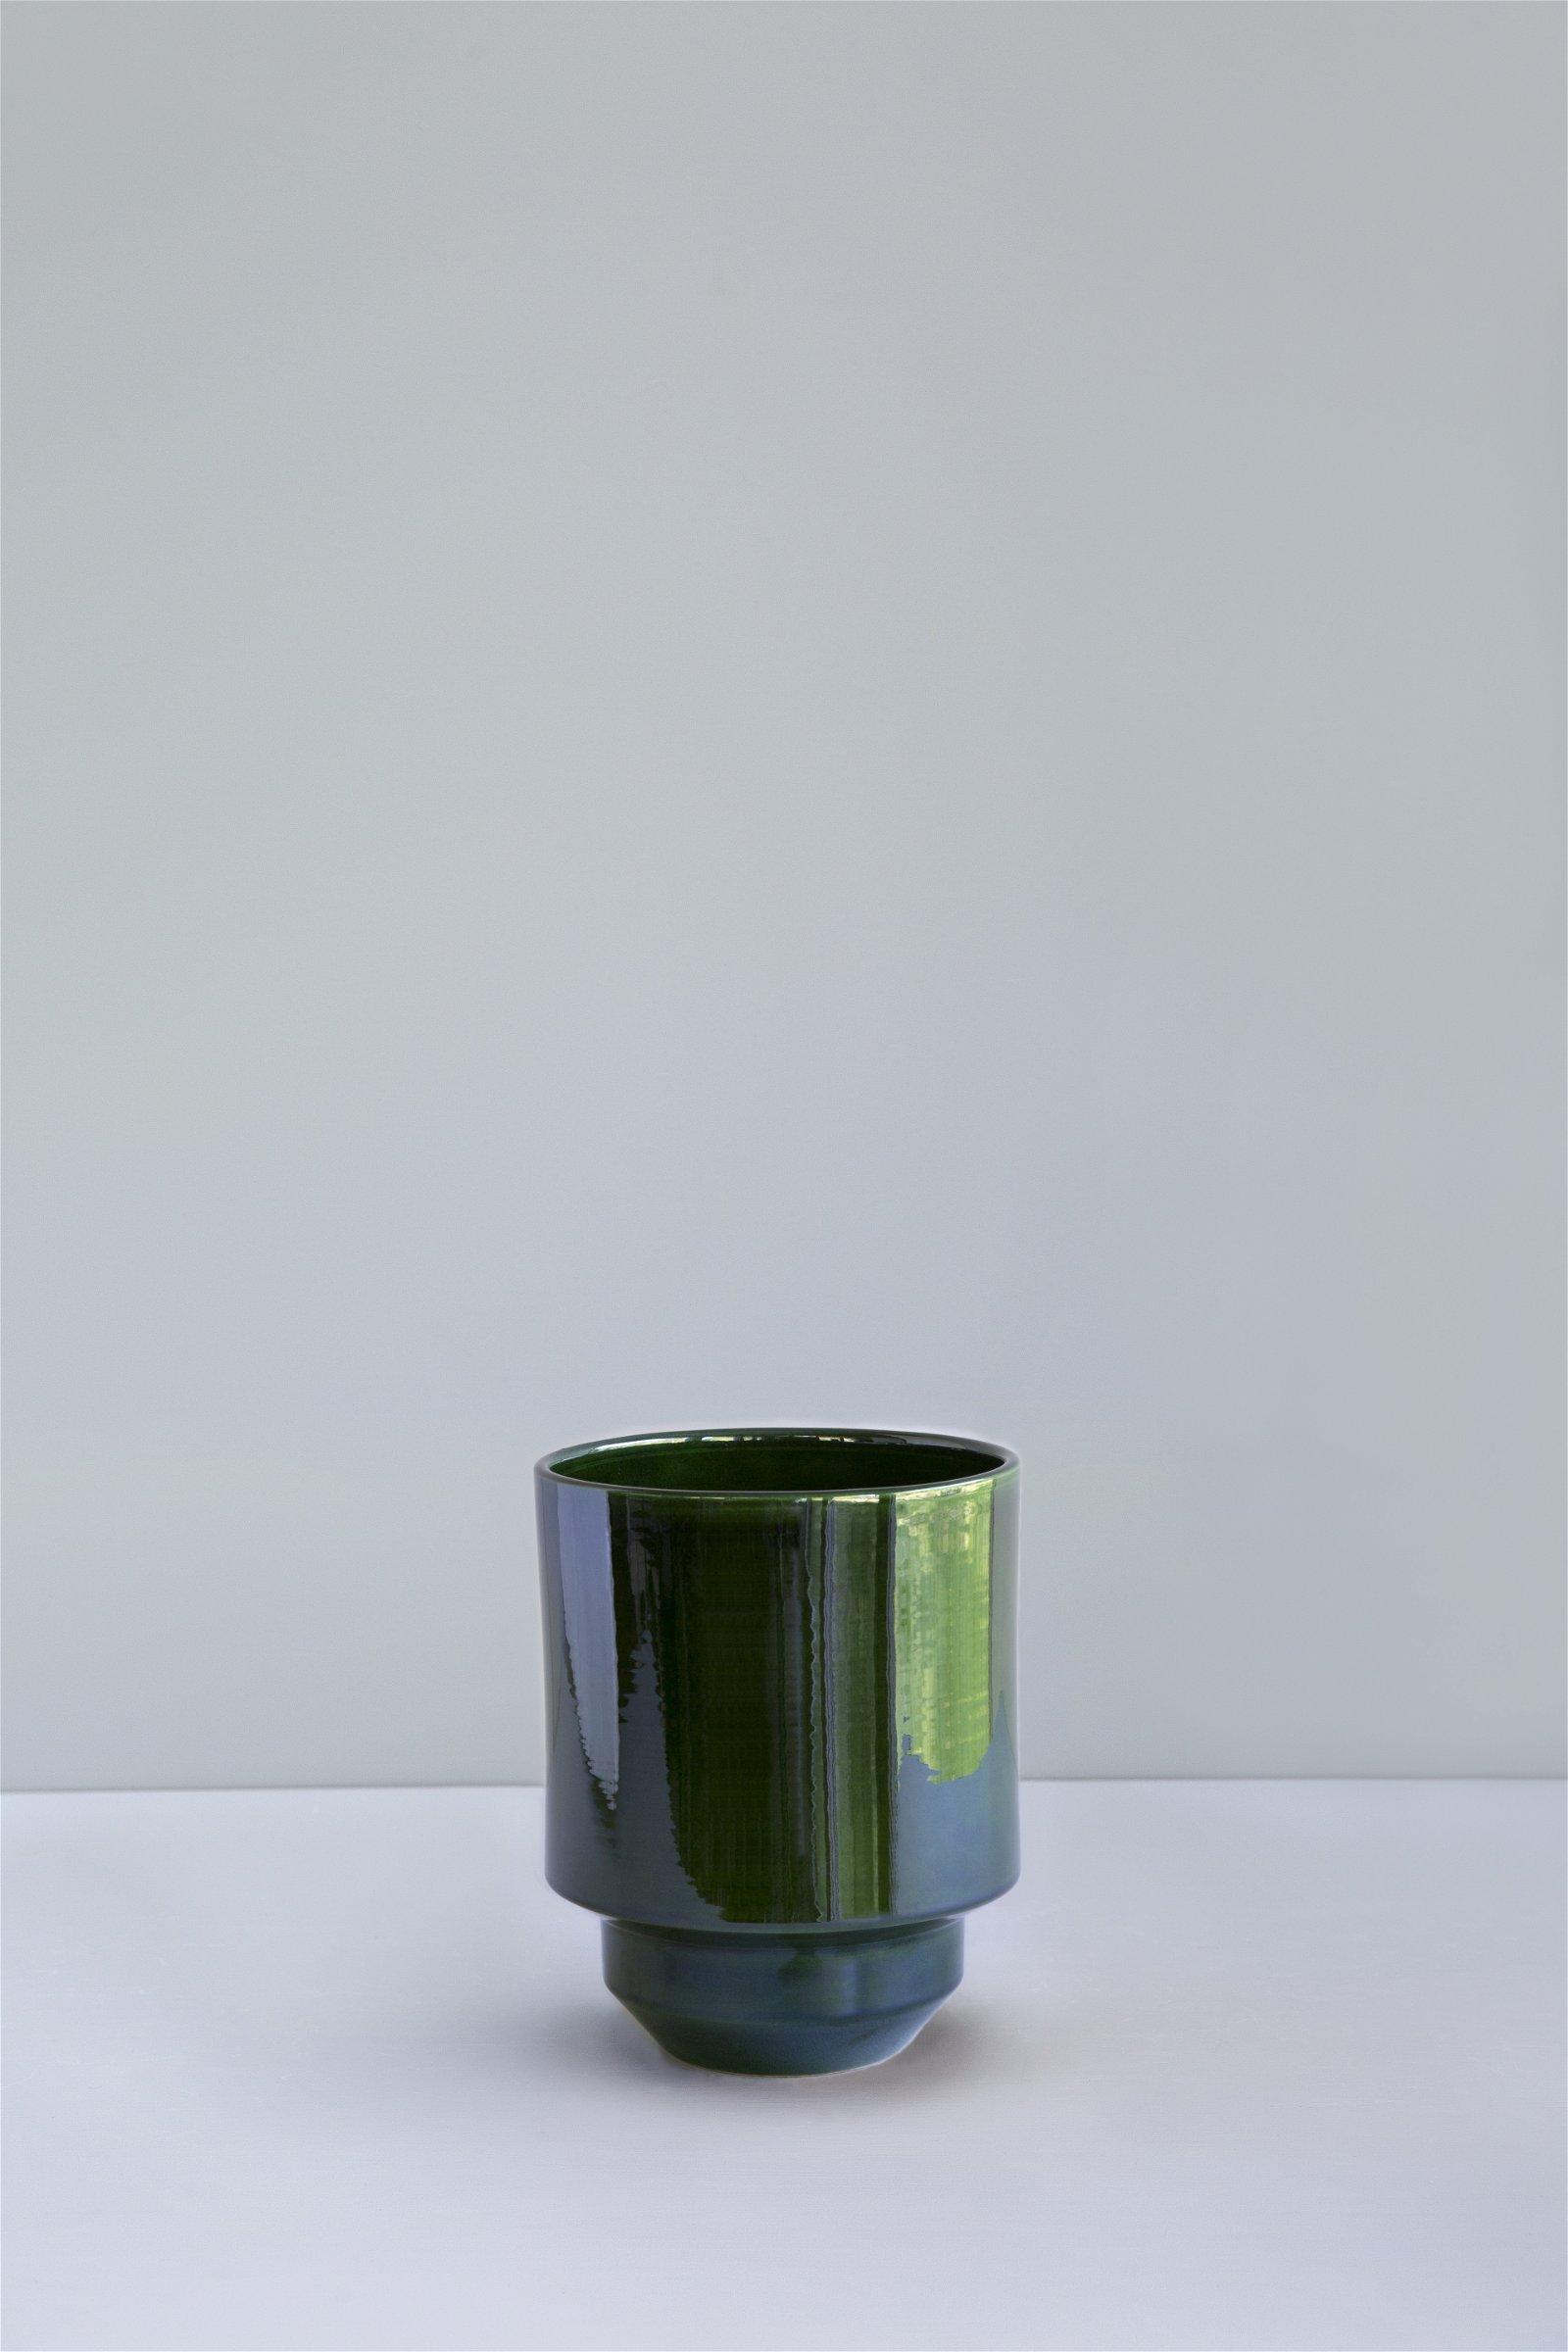 Bergs Potter, The Hoff Pot GLAZED: Emerald Green, 18 cm, Potte